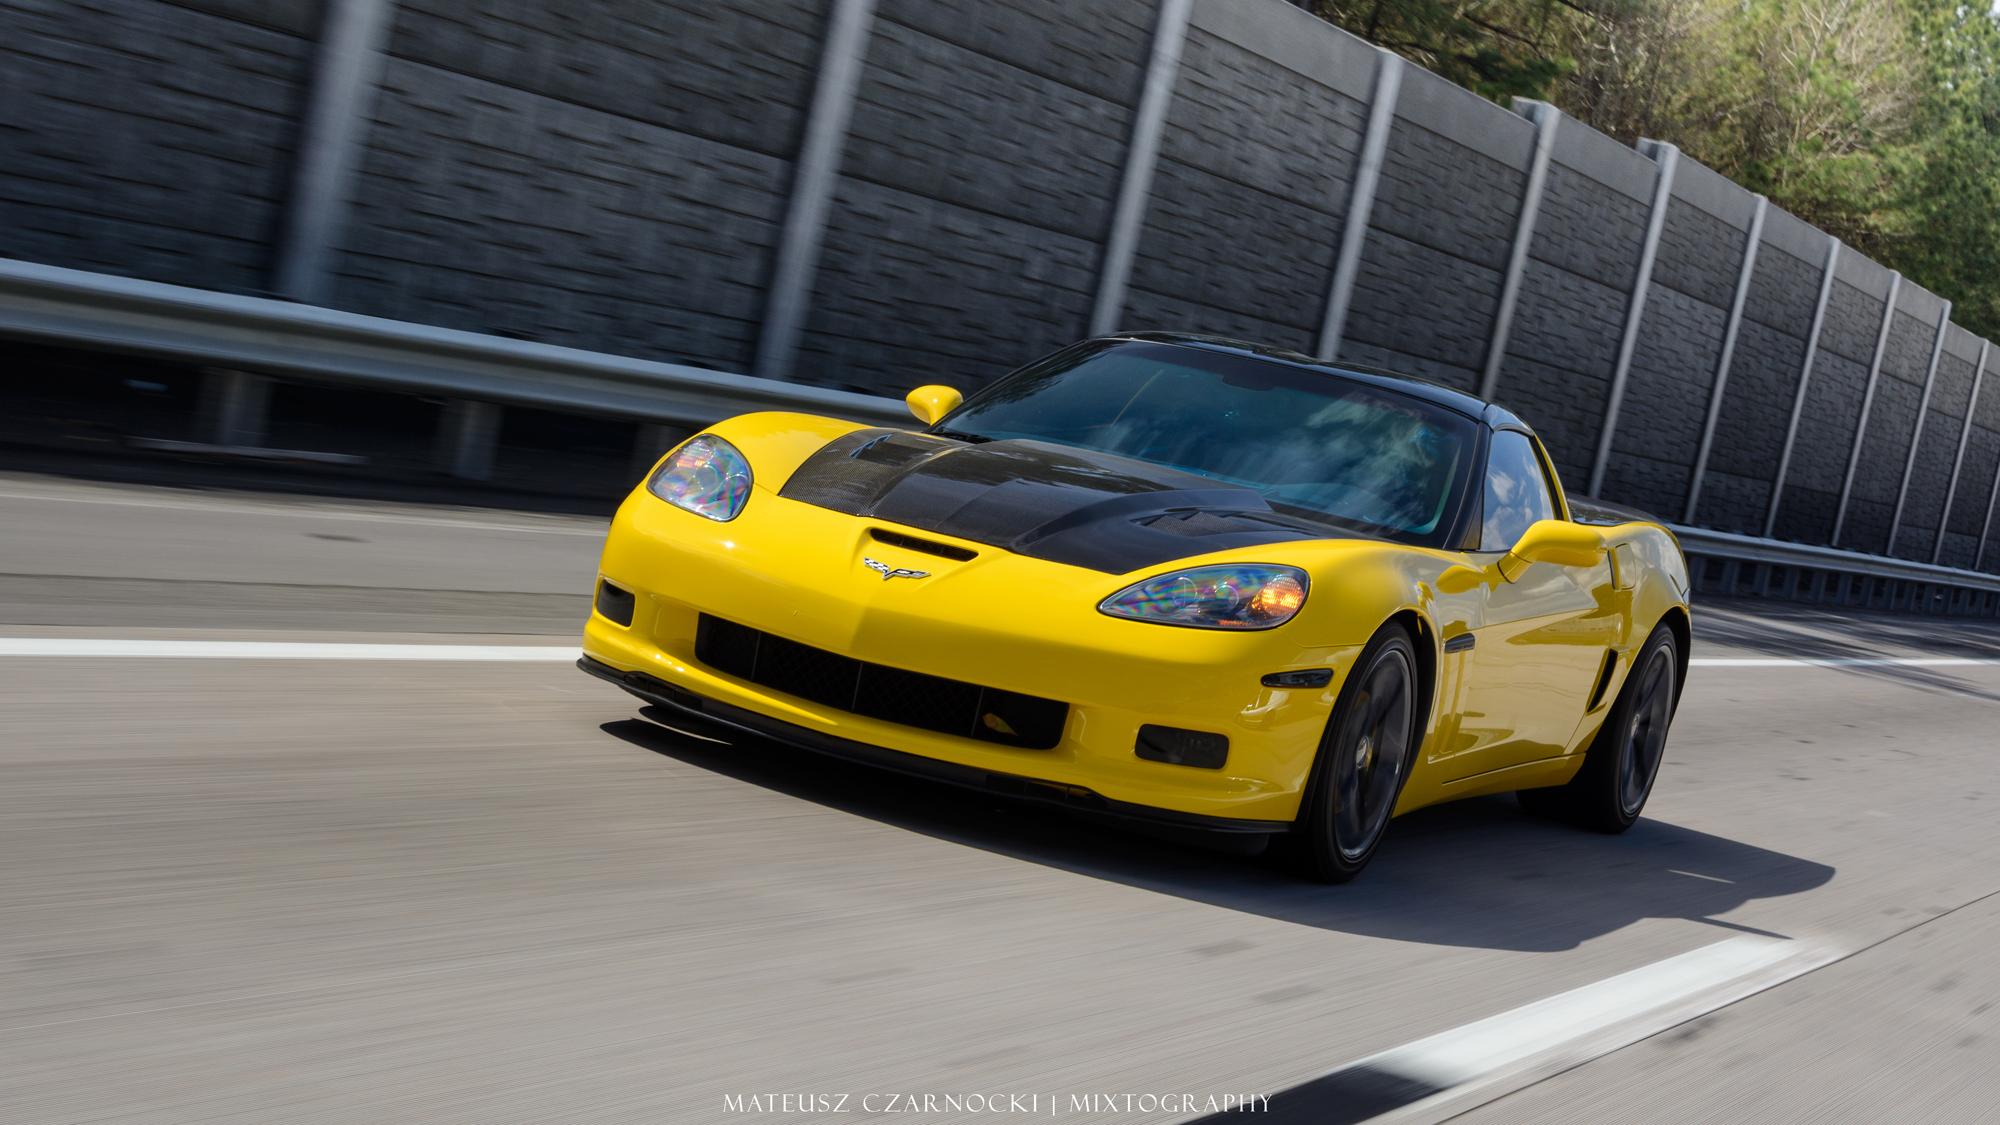 #WallpaperWednesday: Chevy Corvette C6 Edition